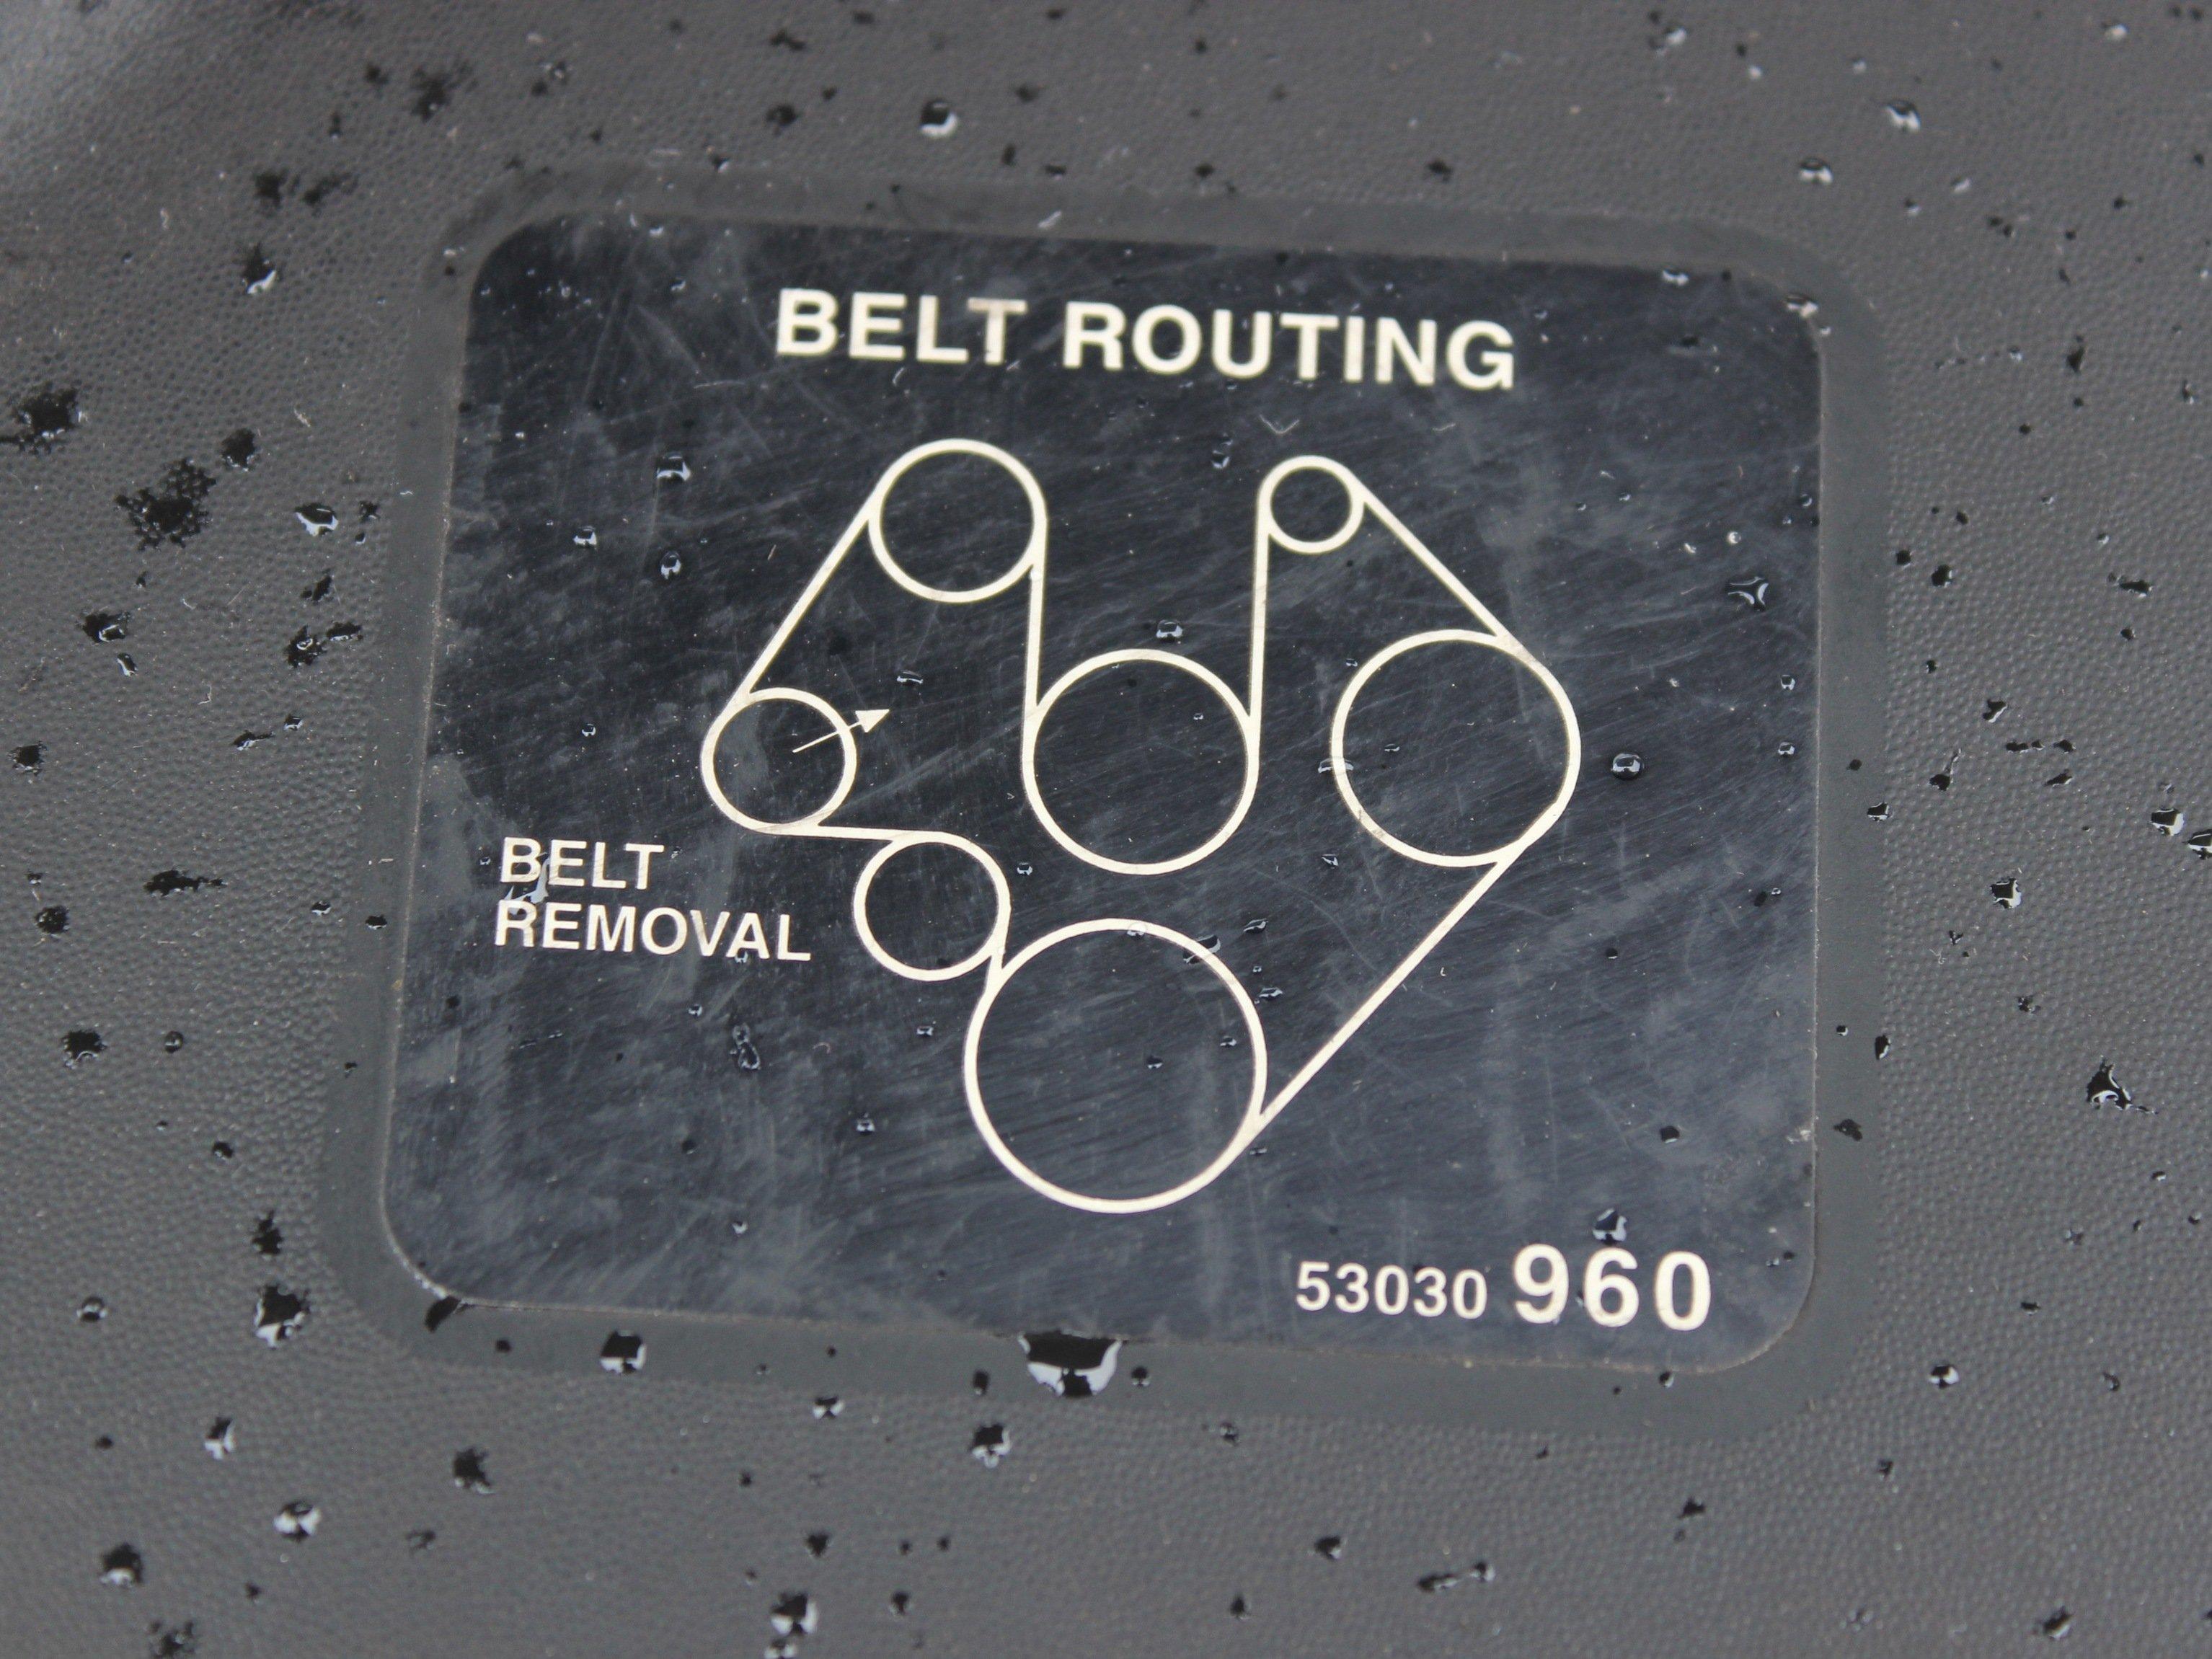 2003 Jeep Grand Cherokee Serpentine Belt Replacement Ifixit Repair Guide